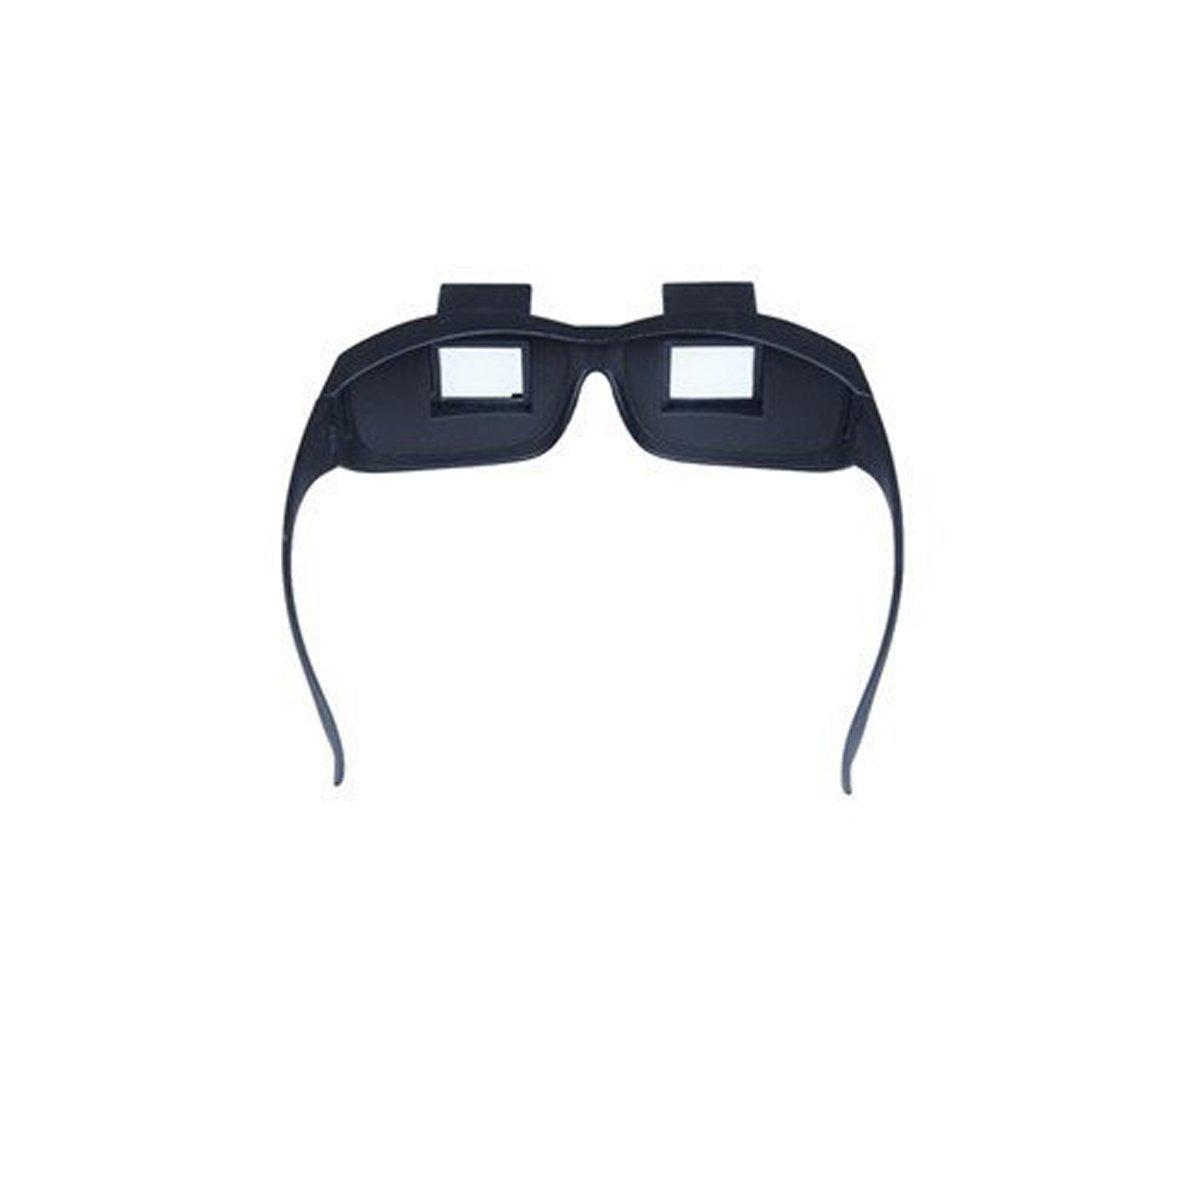 37207bc43bb ZURU BUNCH High Definition Horizontal Lazy Reader Glasses for Book Reading